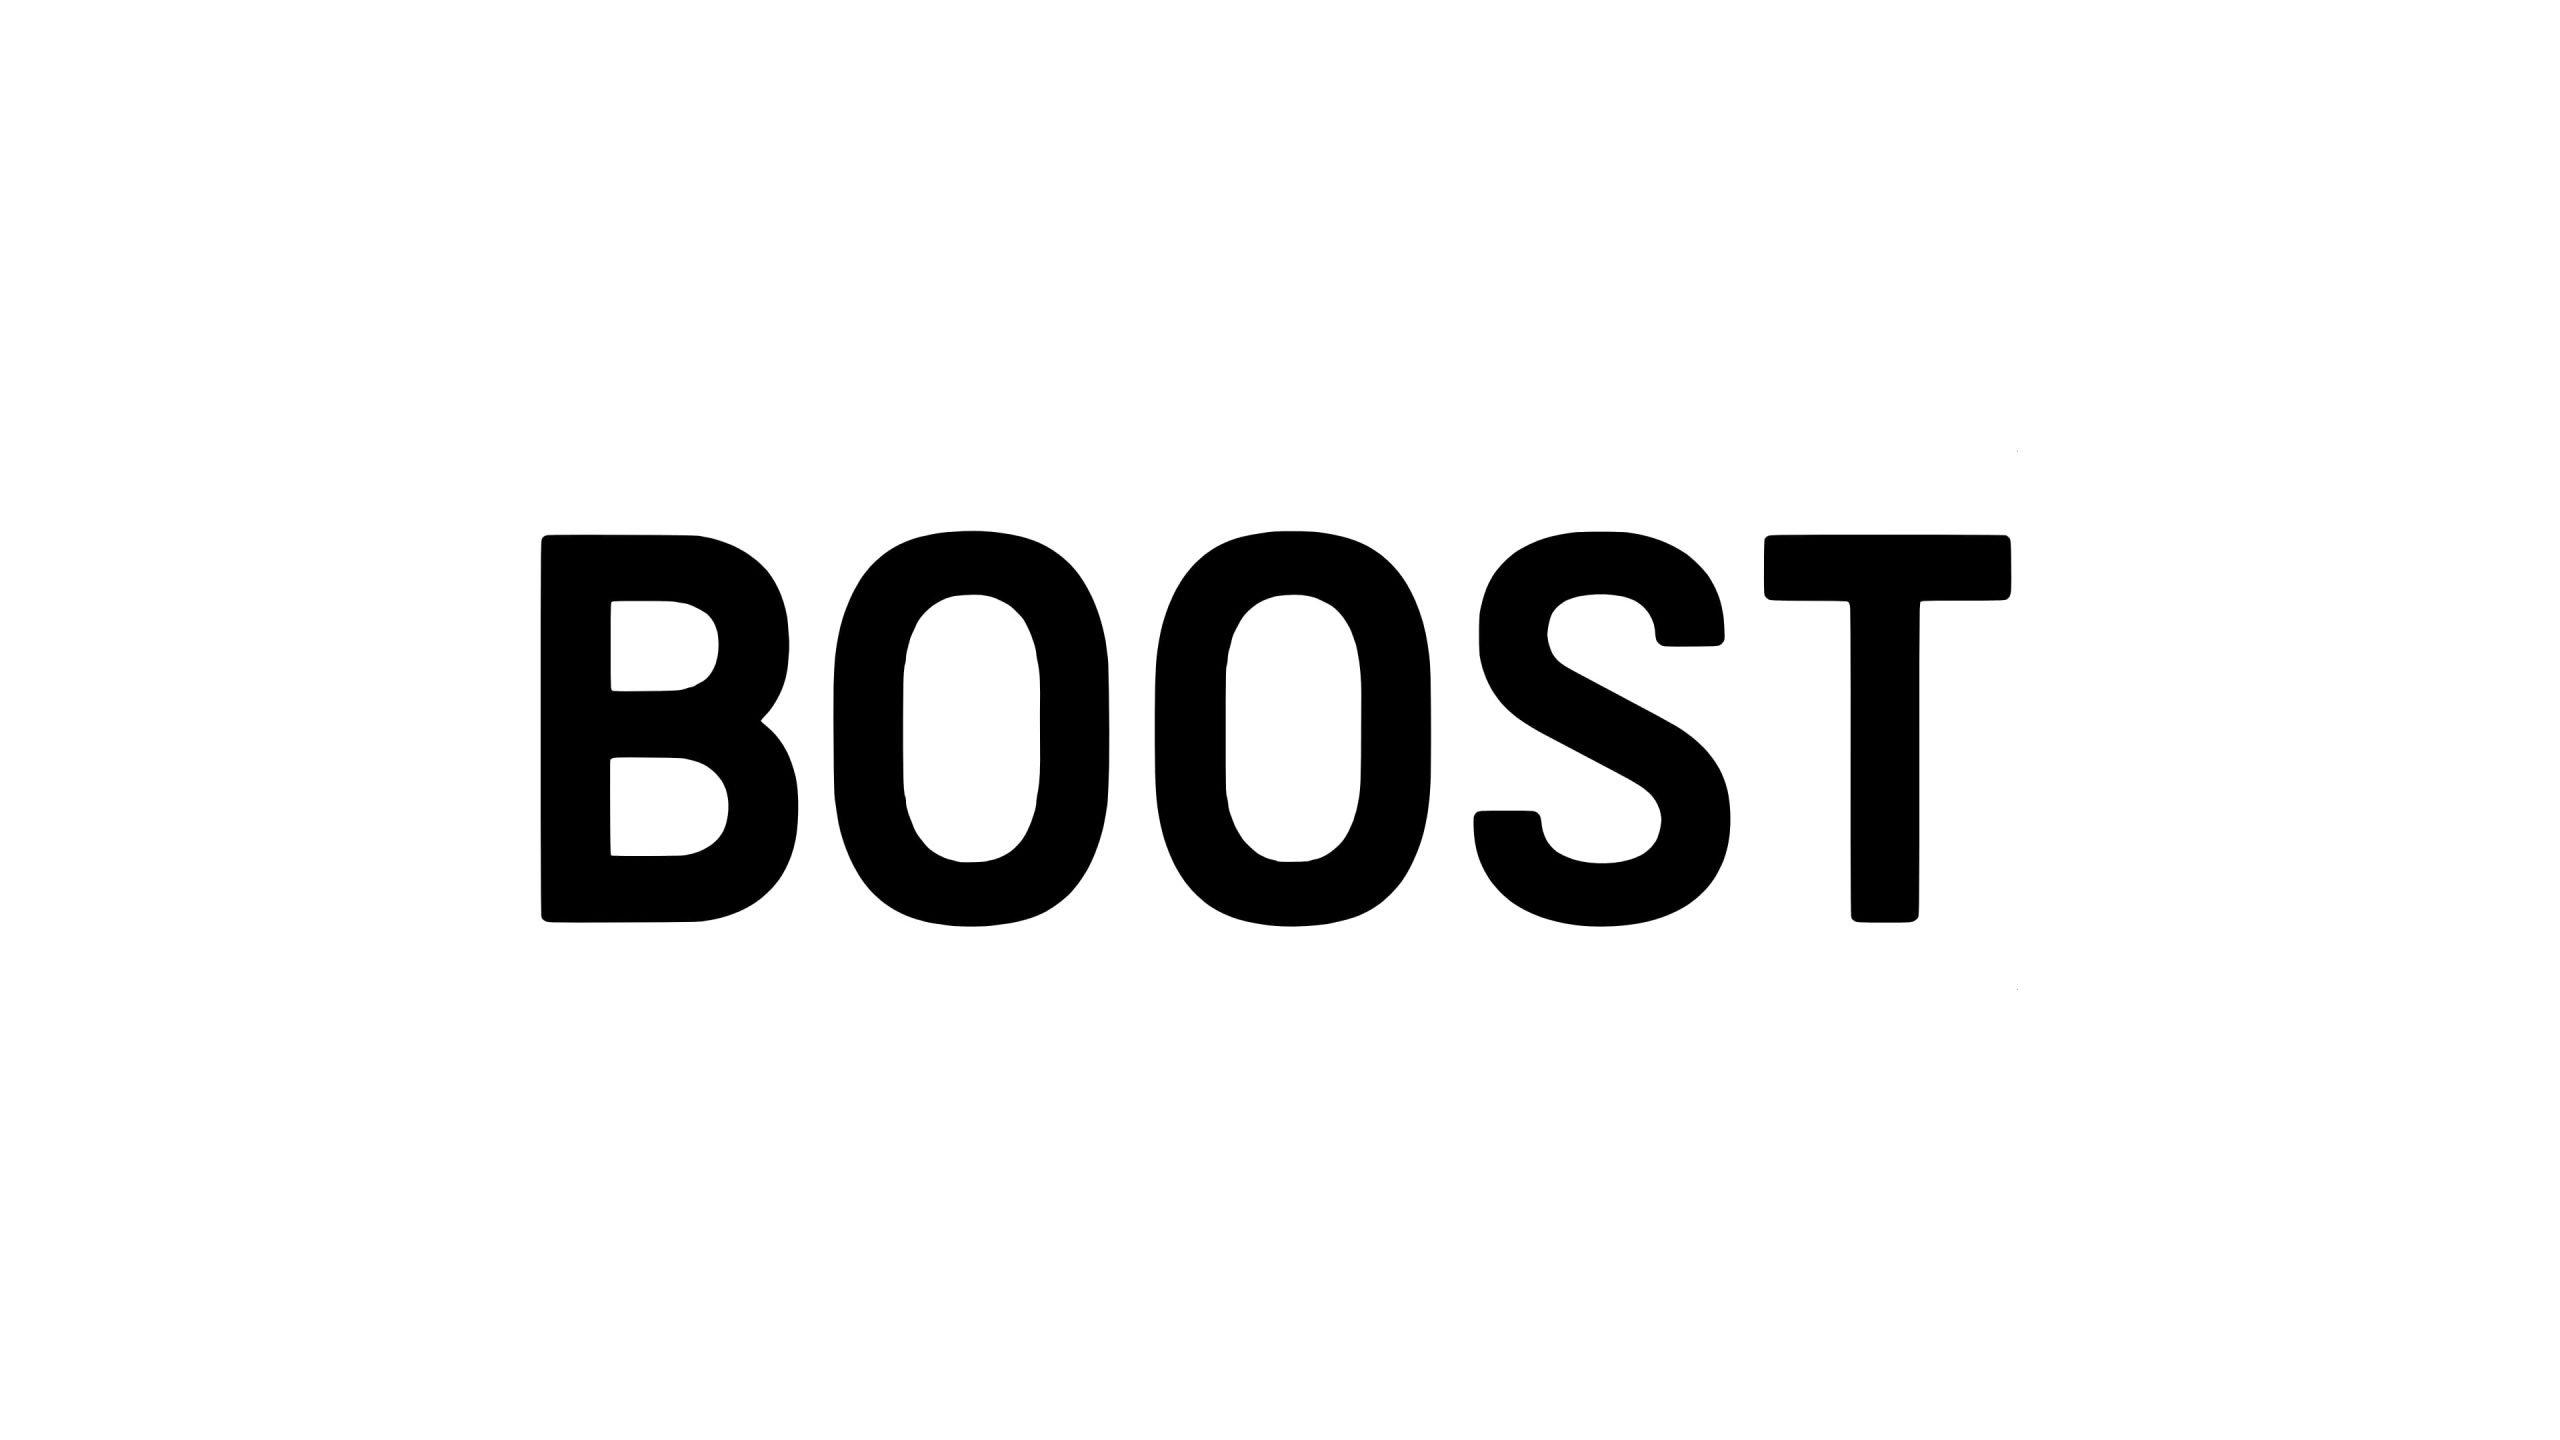 ADIDAS-BOOST-font-full